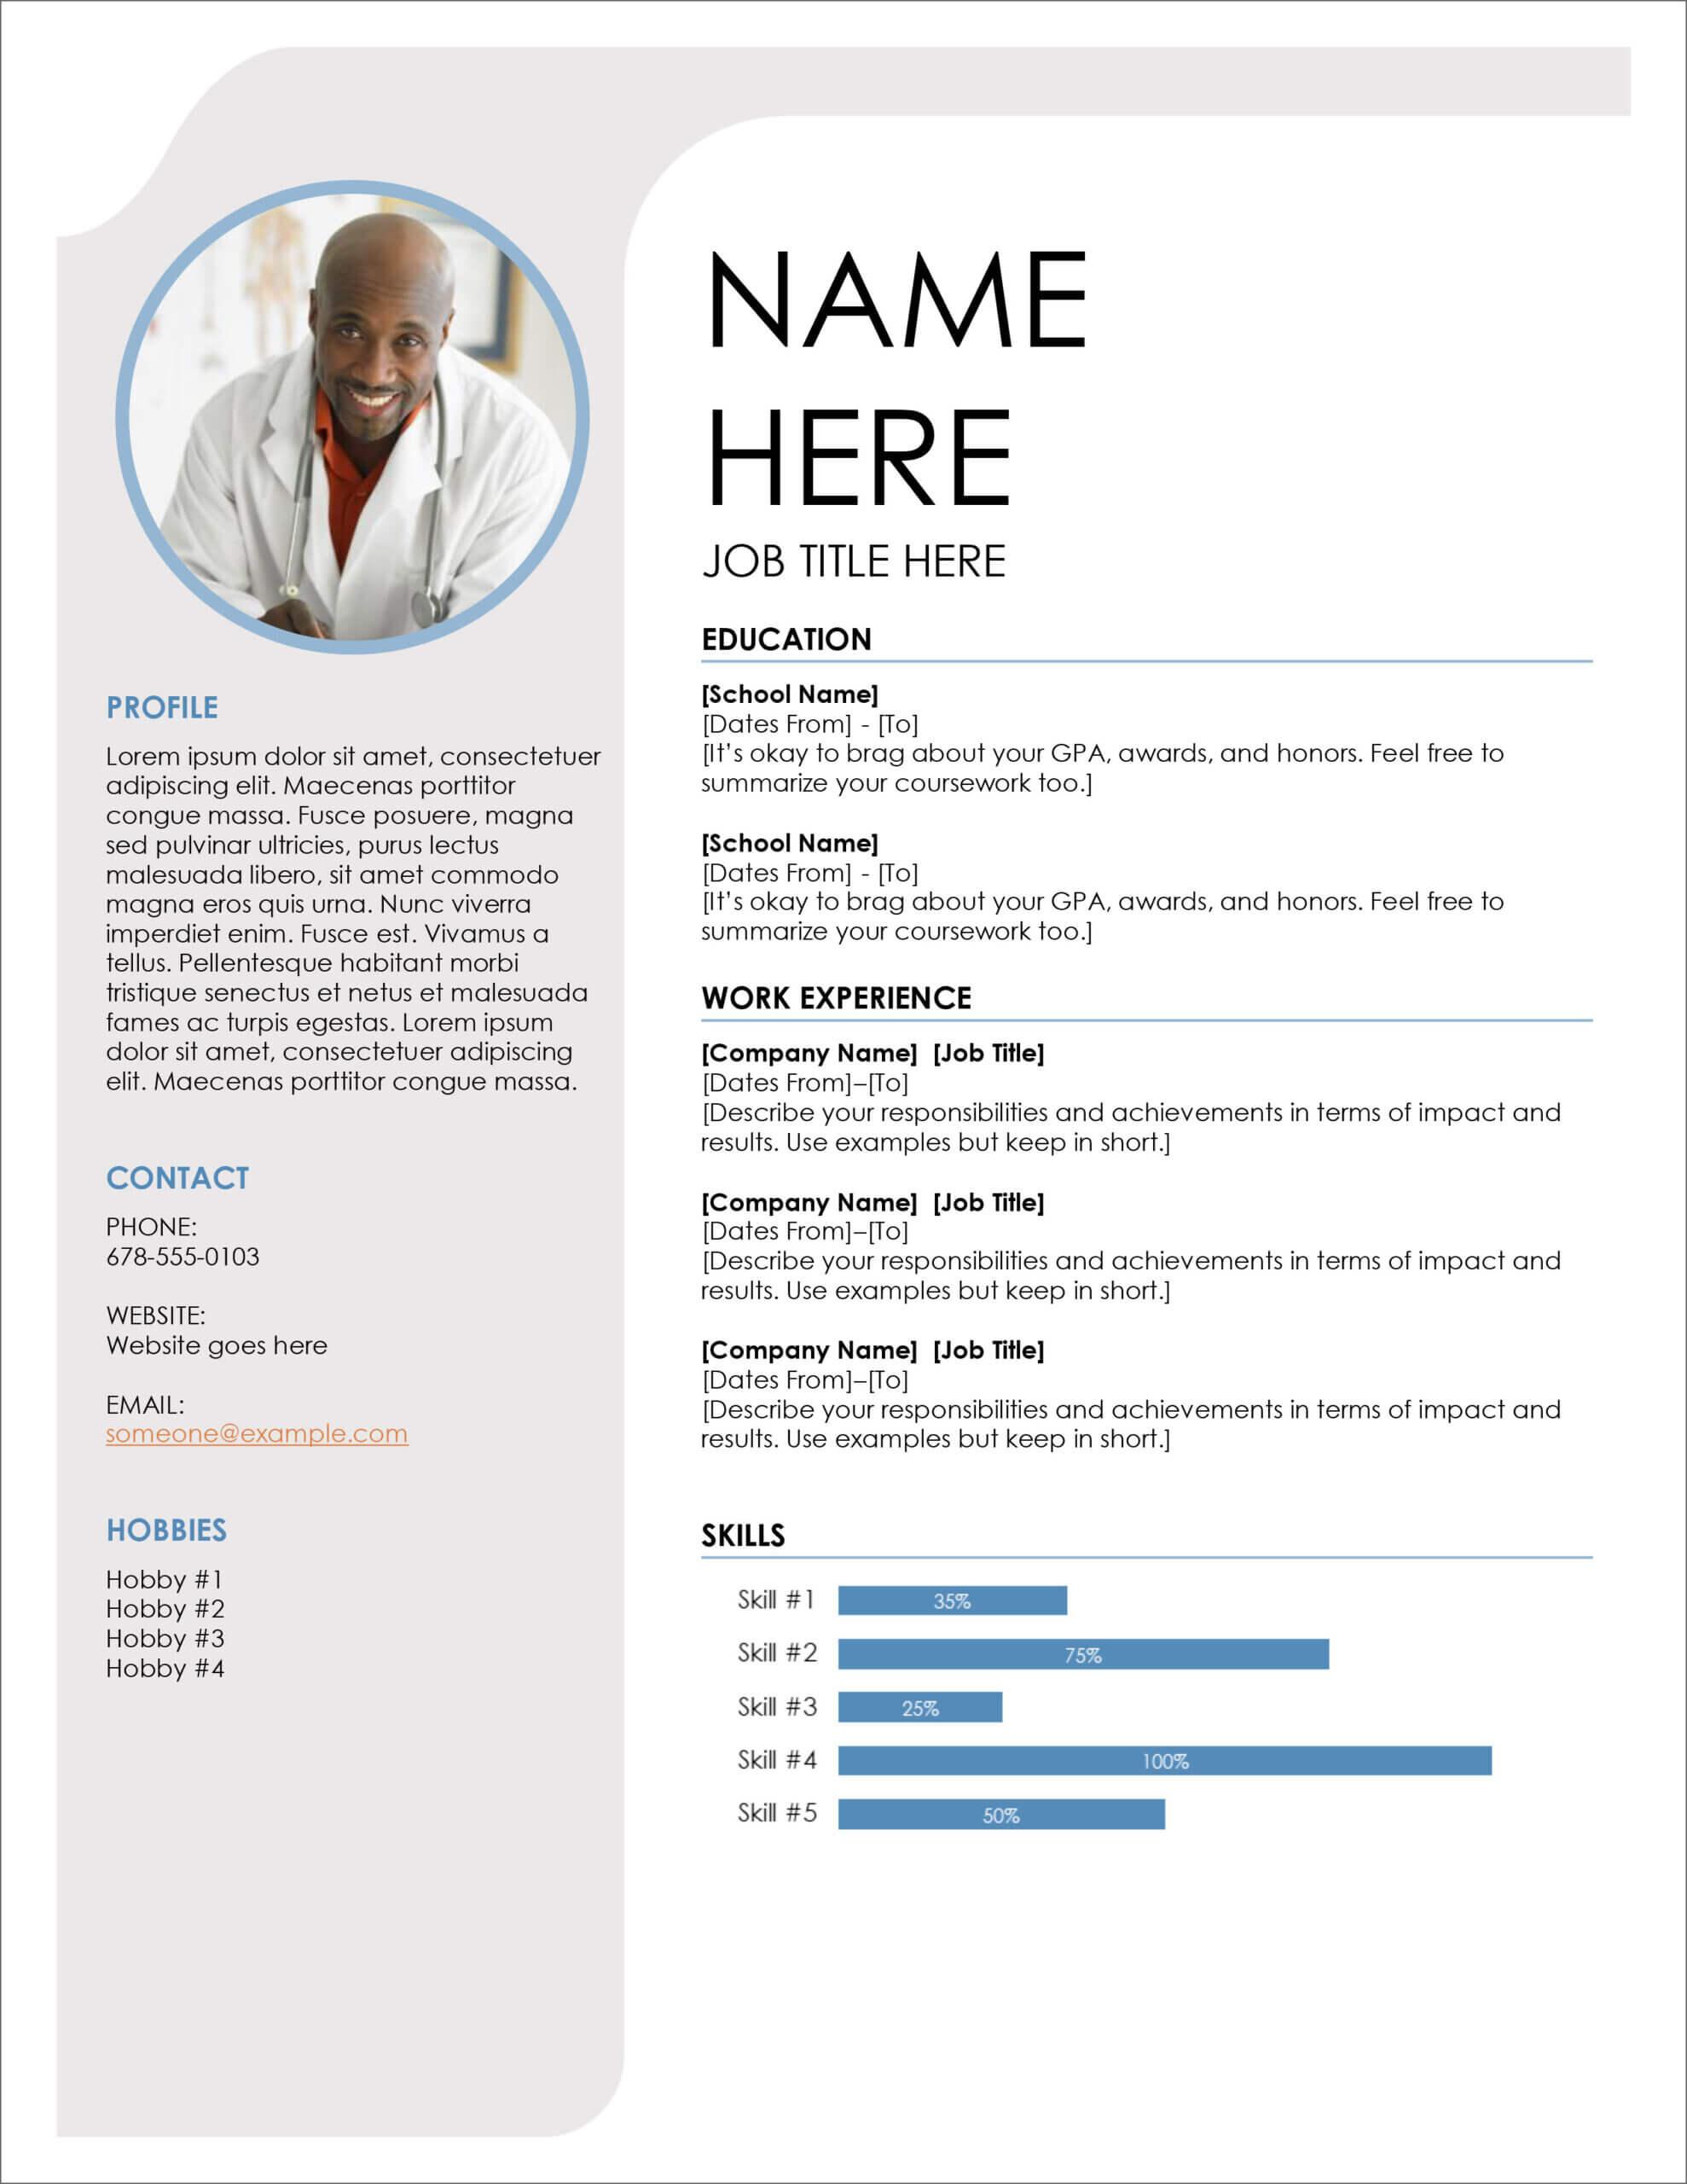 45 Free Modern Resume / Cv Templates – Minimalist, Simple In Resume Templates Word 2007